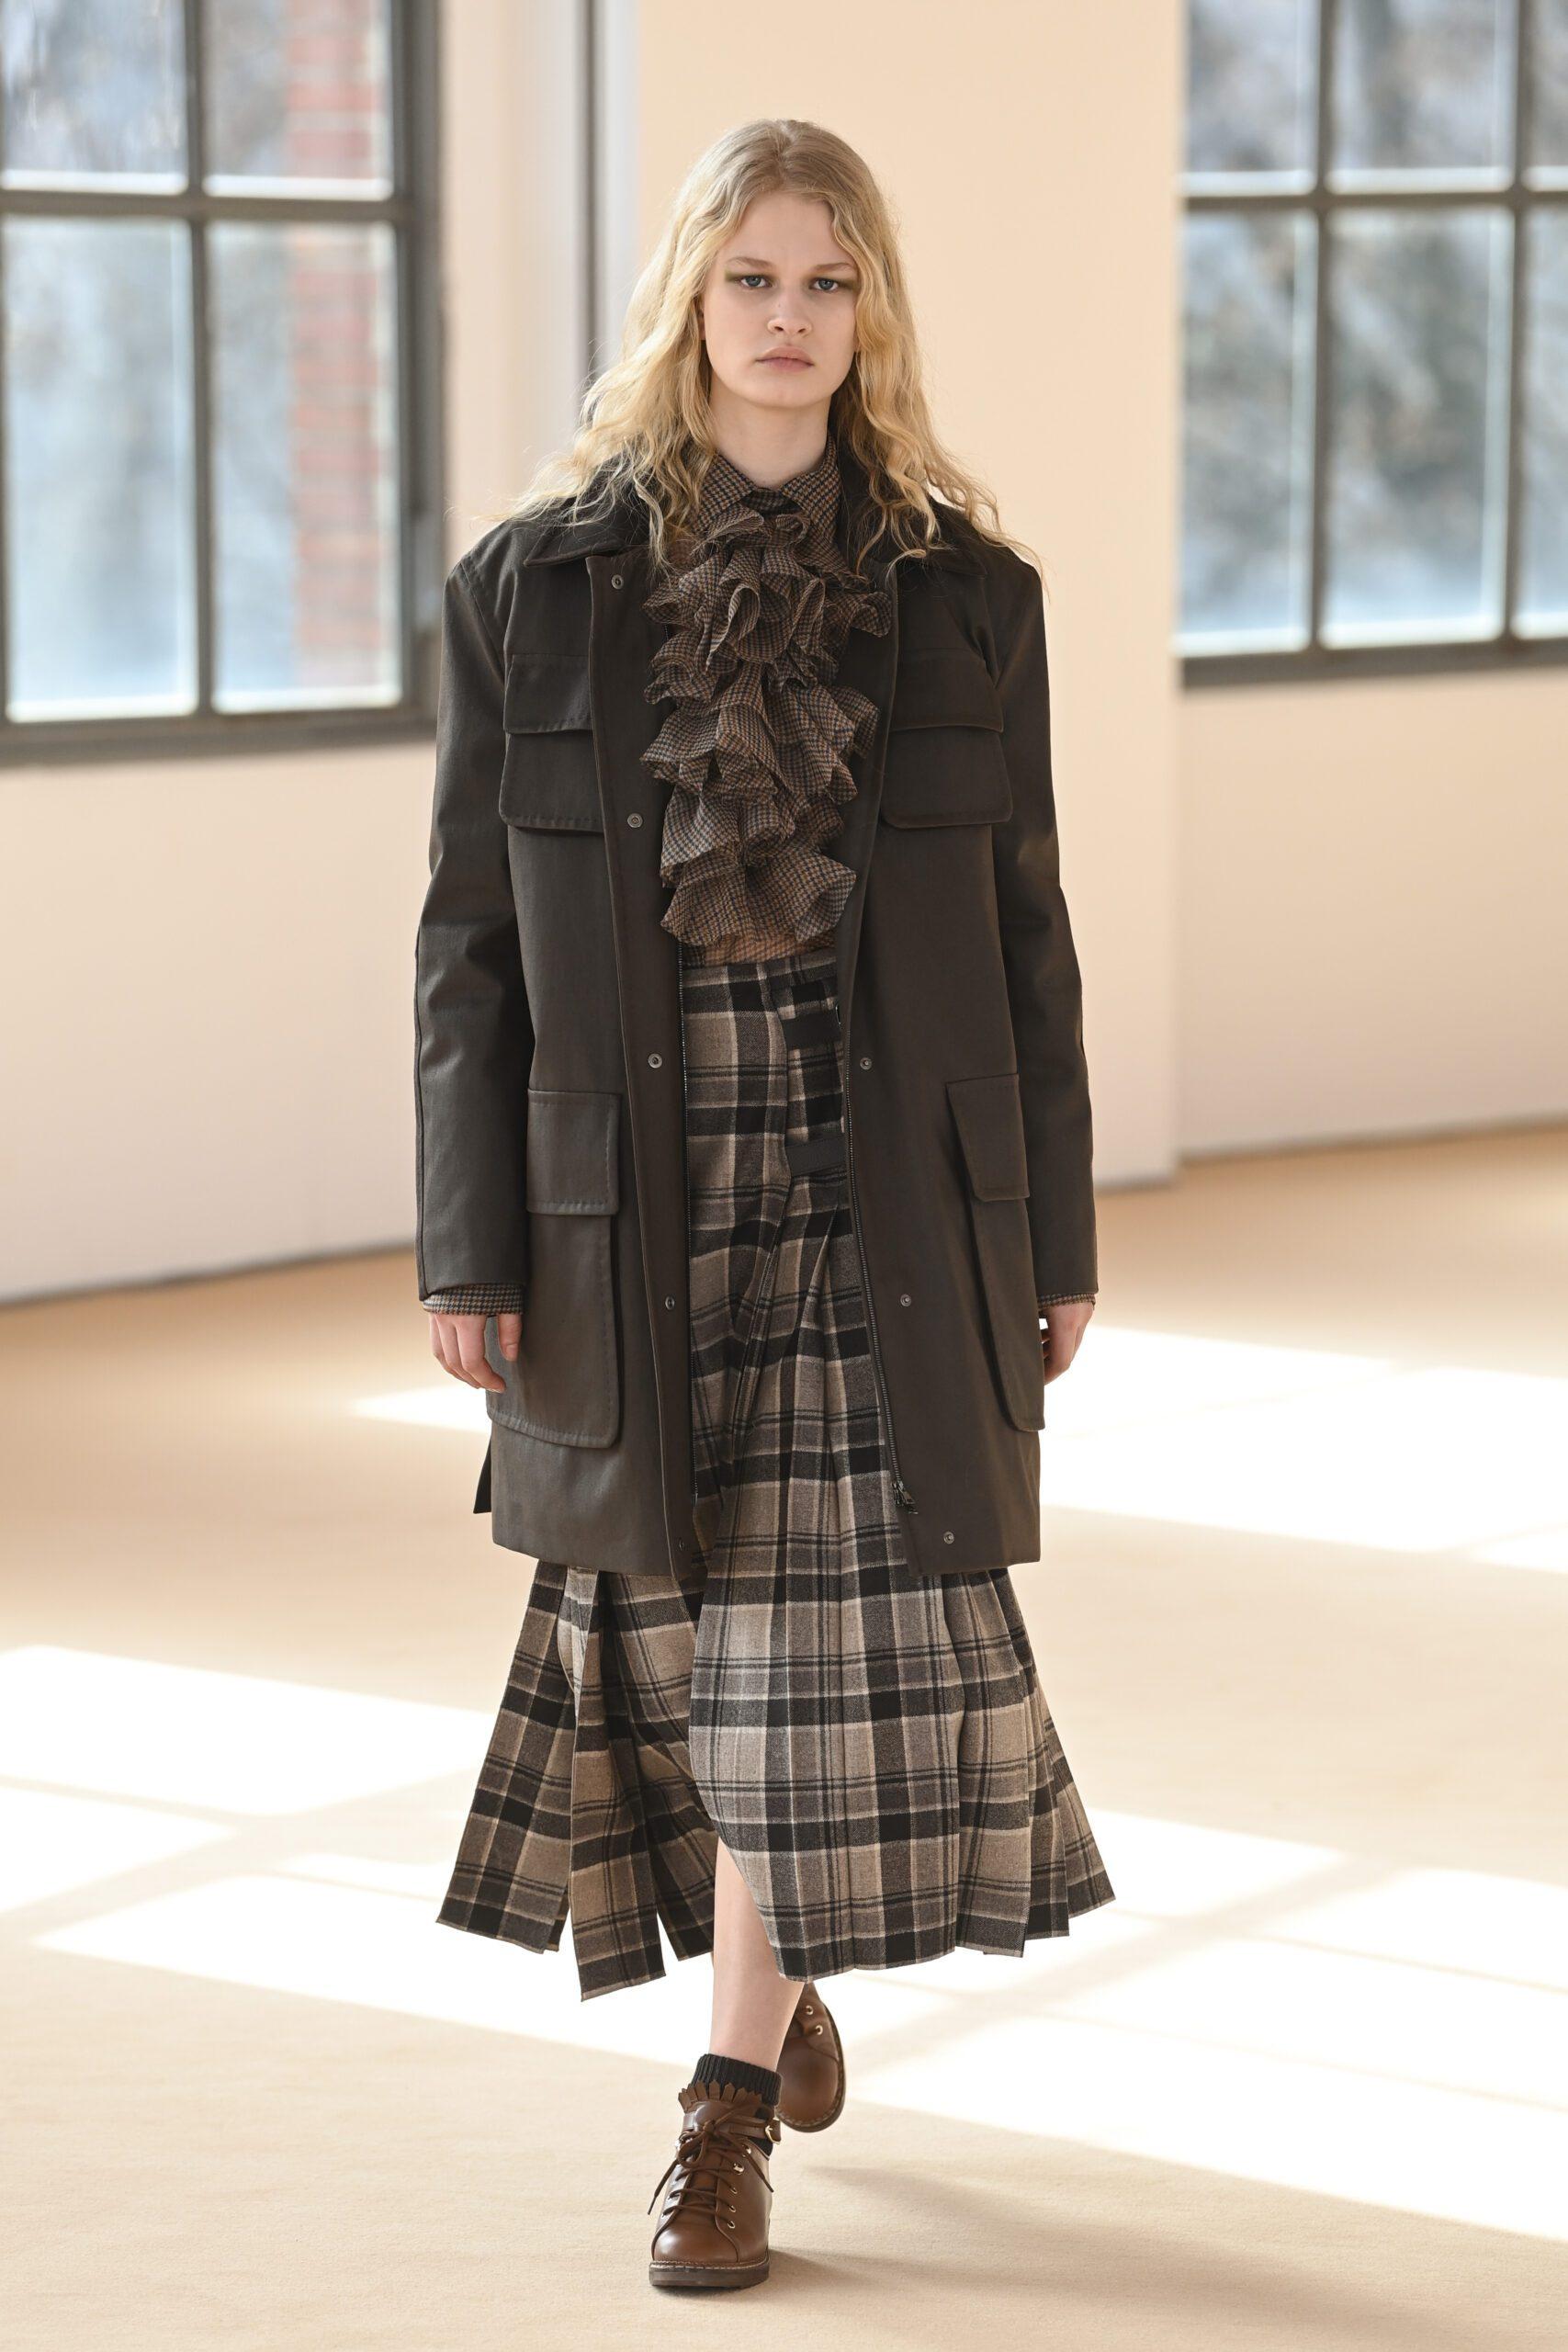 Plaid skirt: Αυτή είναι η φούστα που θα φορέσουμε όλες το φθινόπωρο